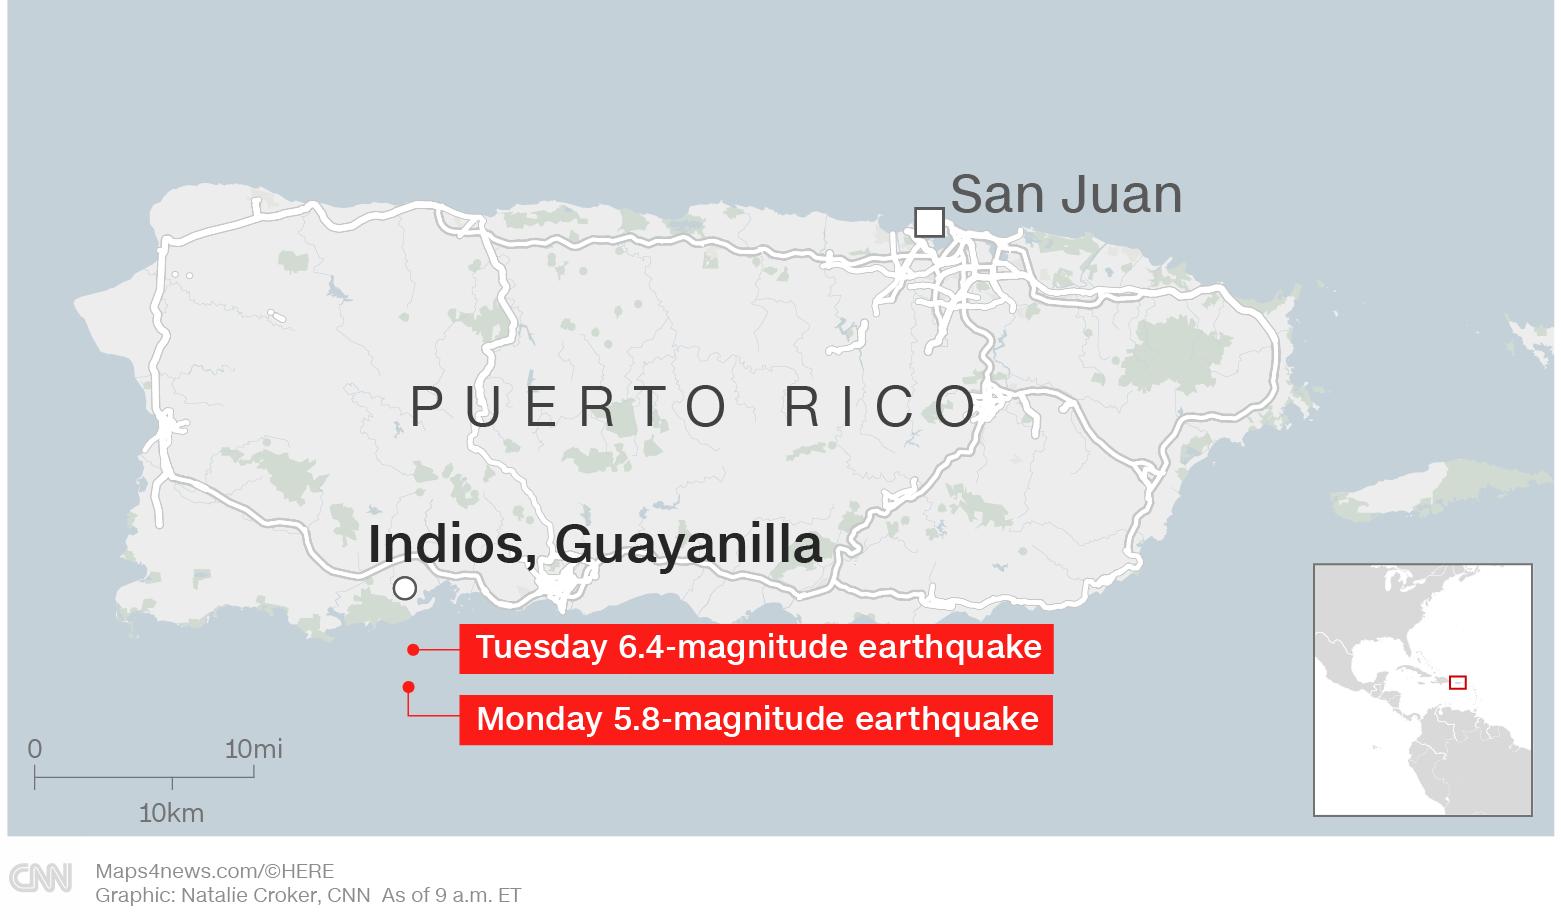 Live updates: Puerto Rico earthquake - CNN